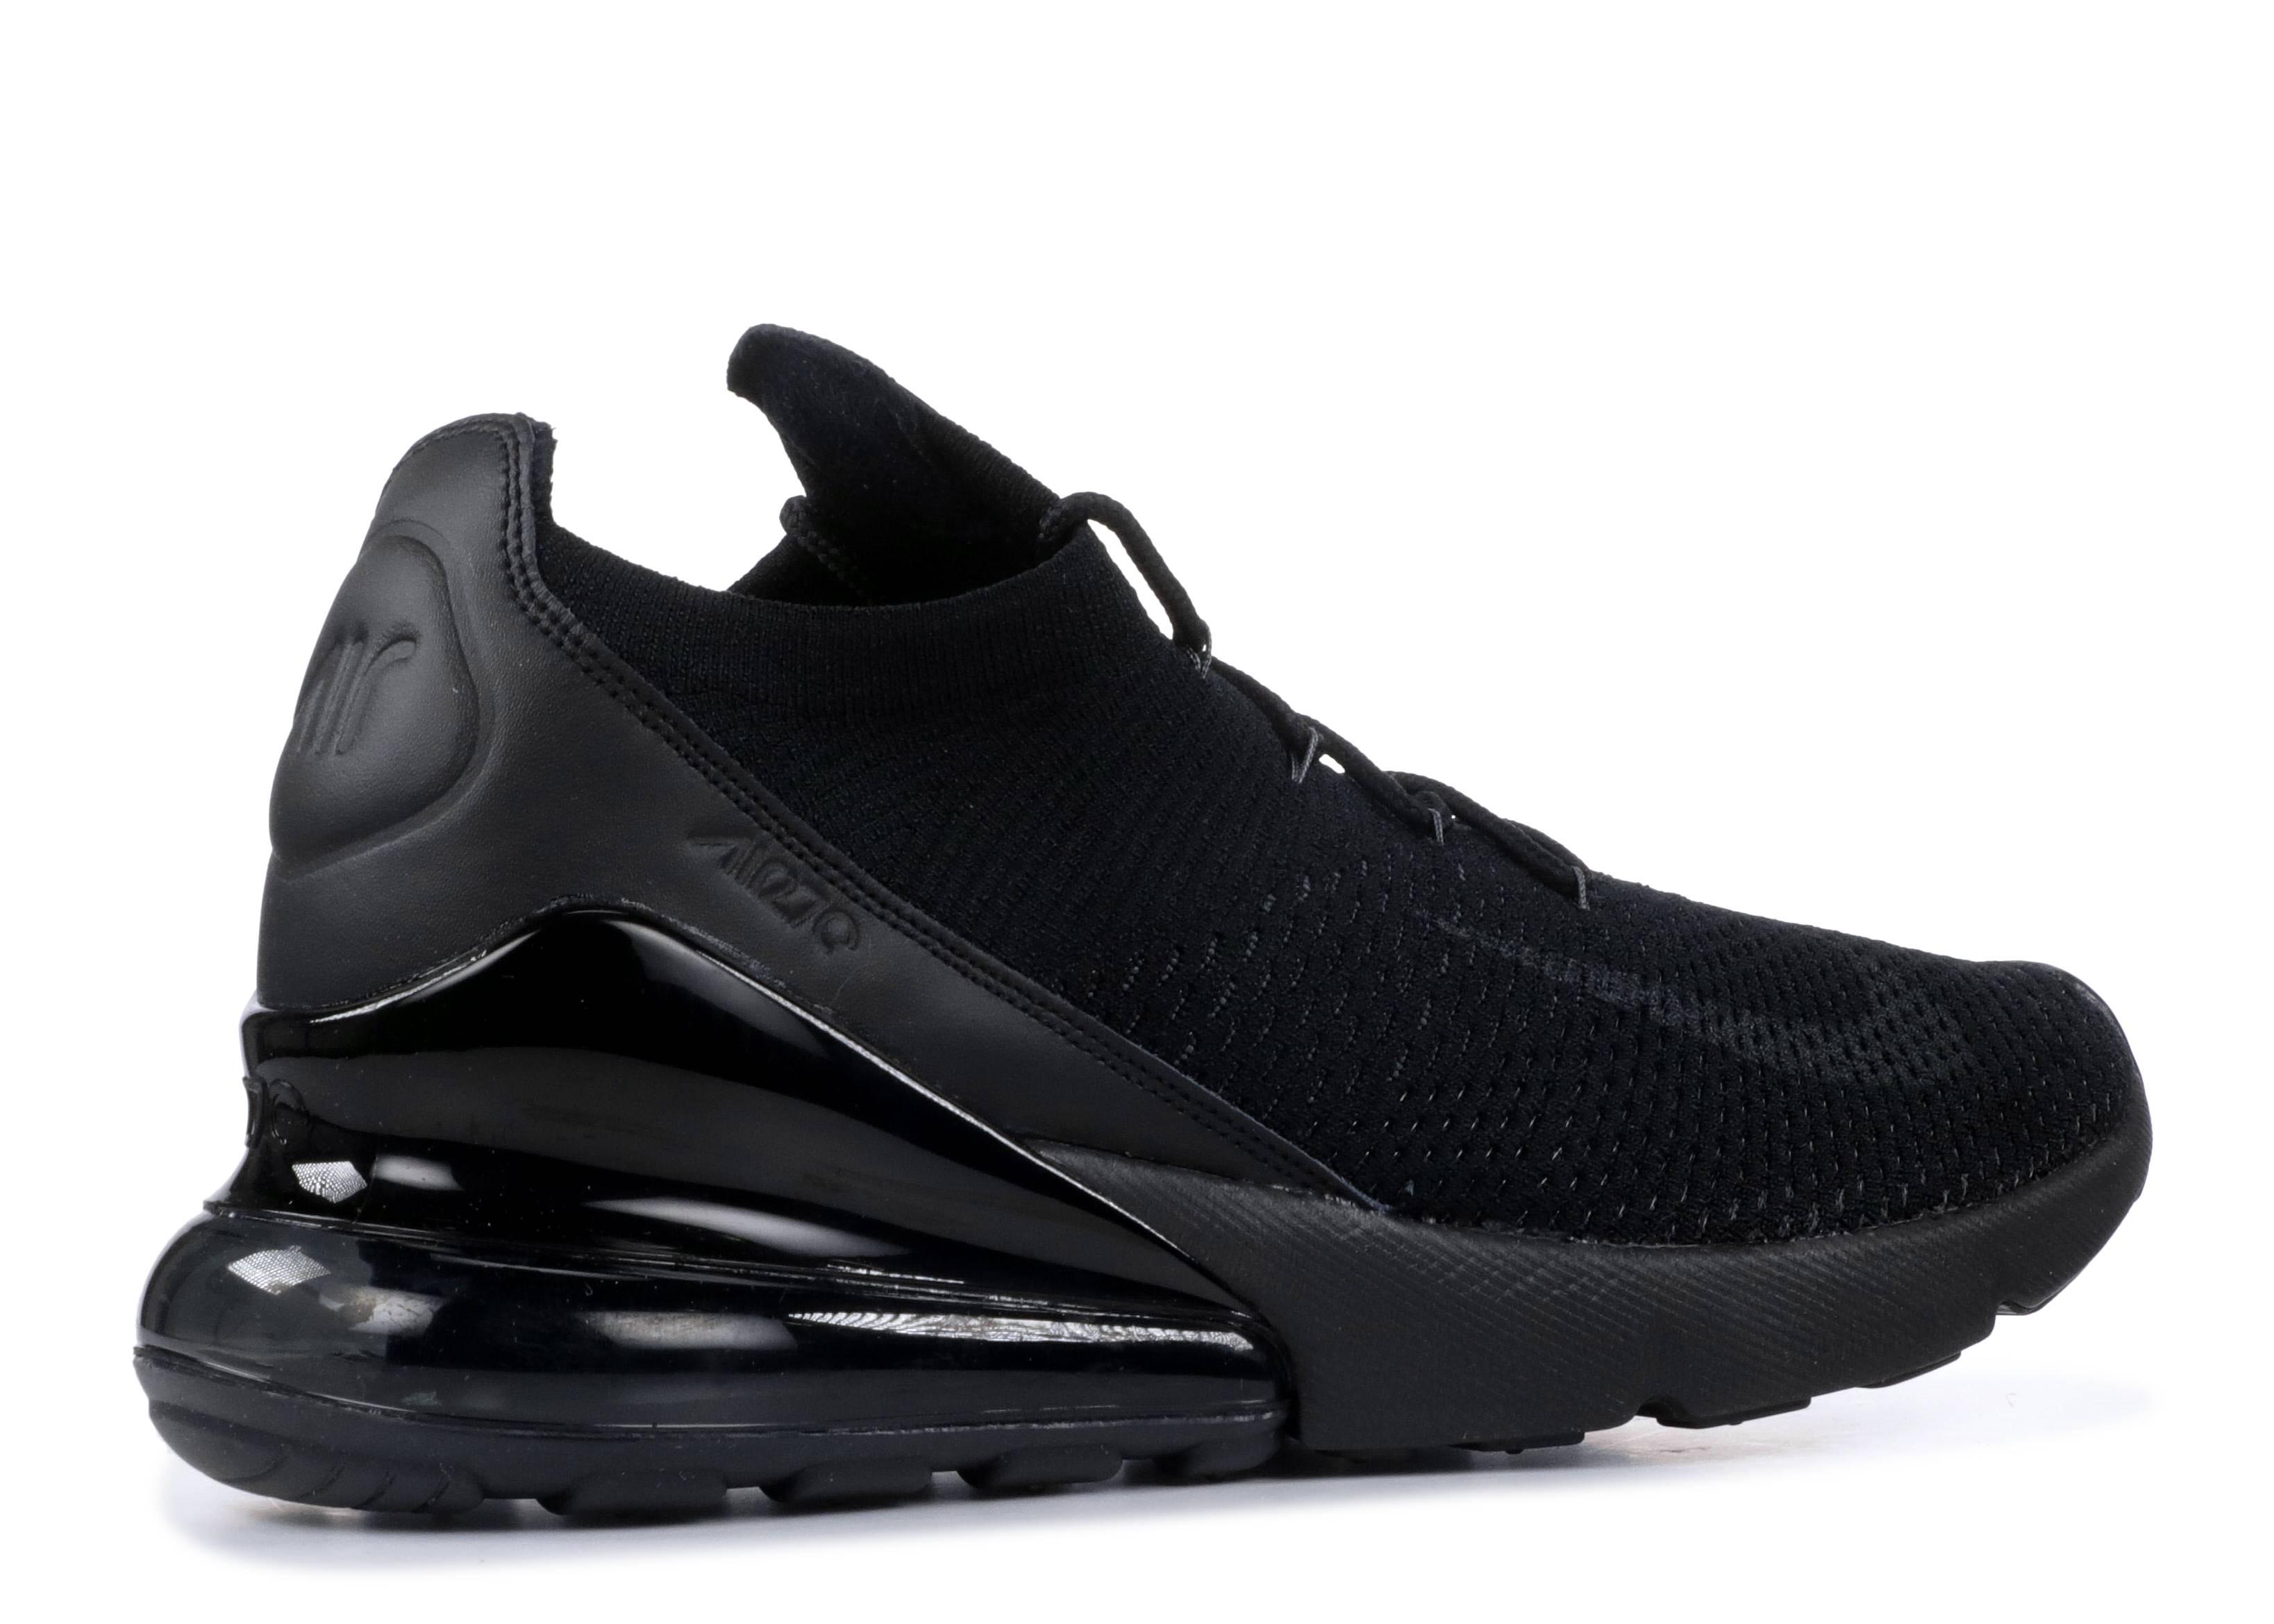 b7d940b676eb Air Max 270 Flyknit - Nike - ao1023 005 - black anthracite-black ...